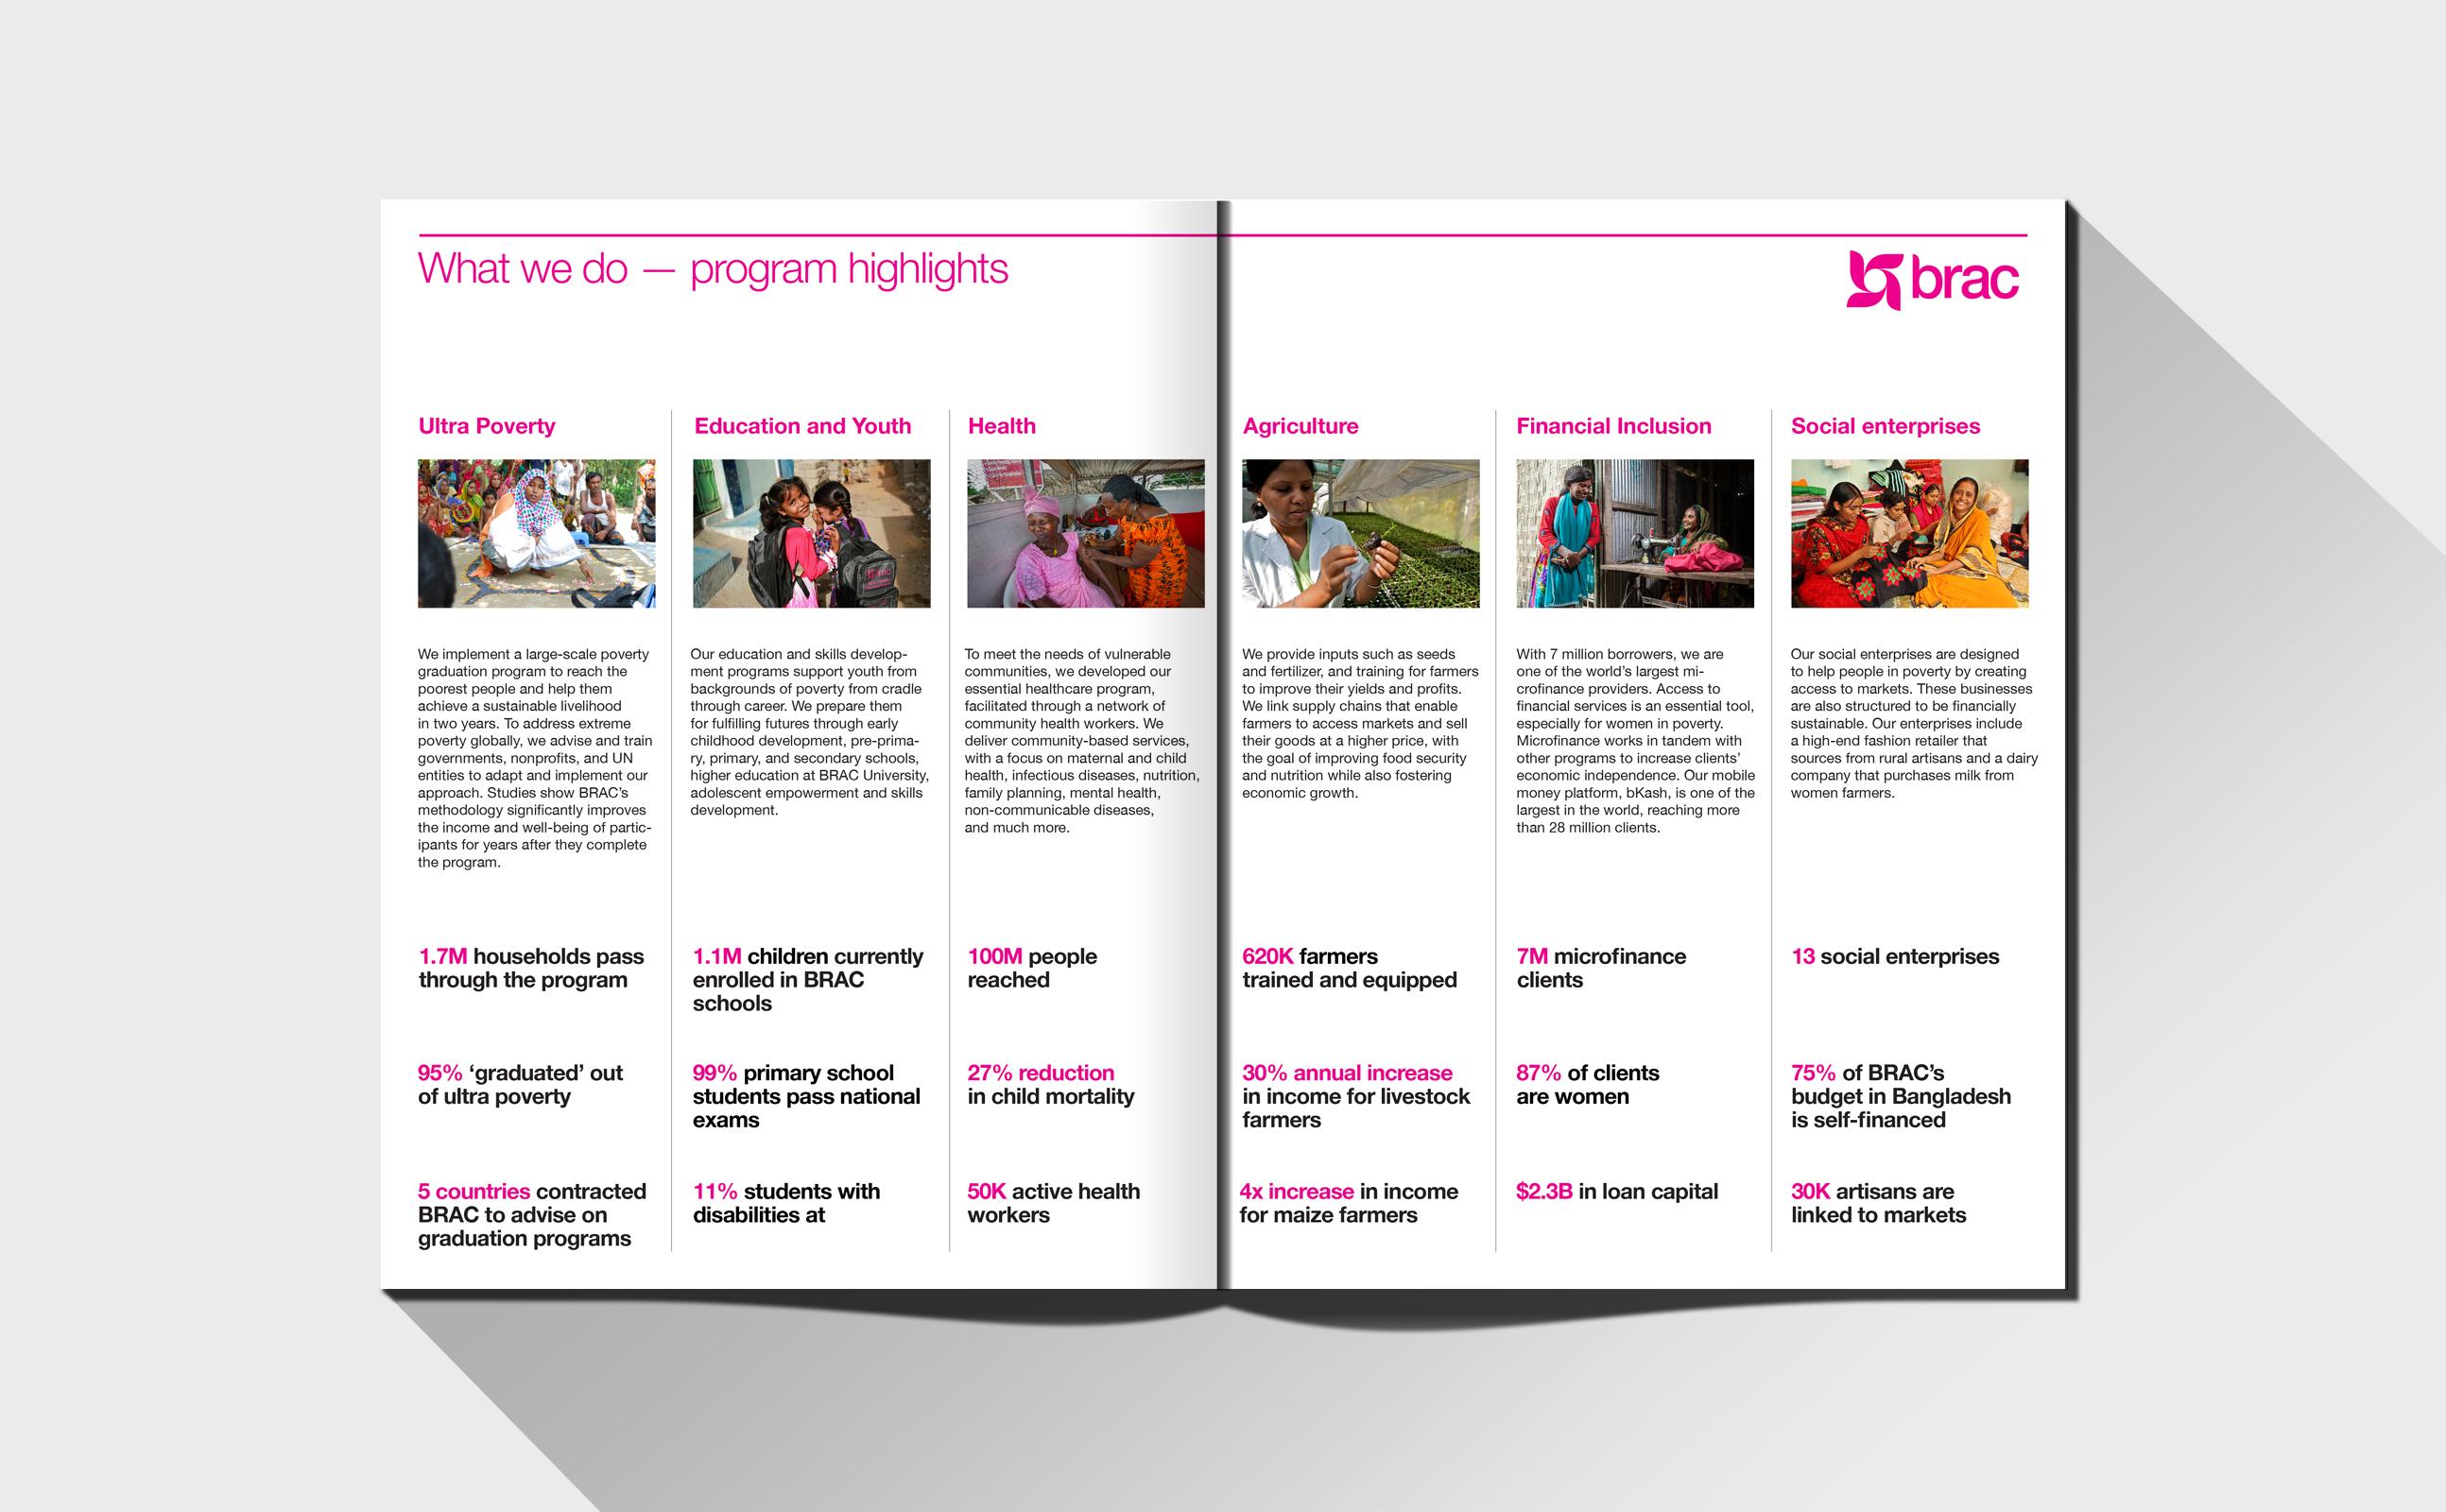 BRAC annual report spread